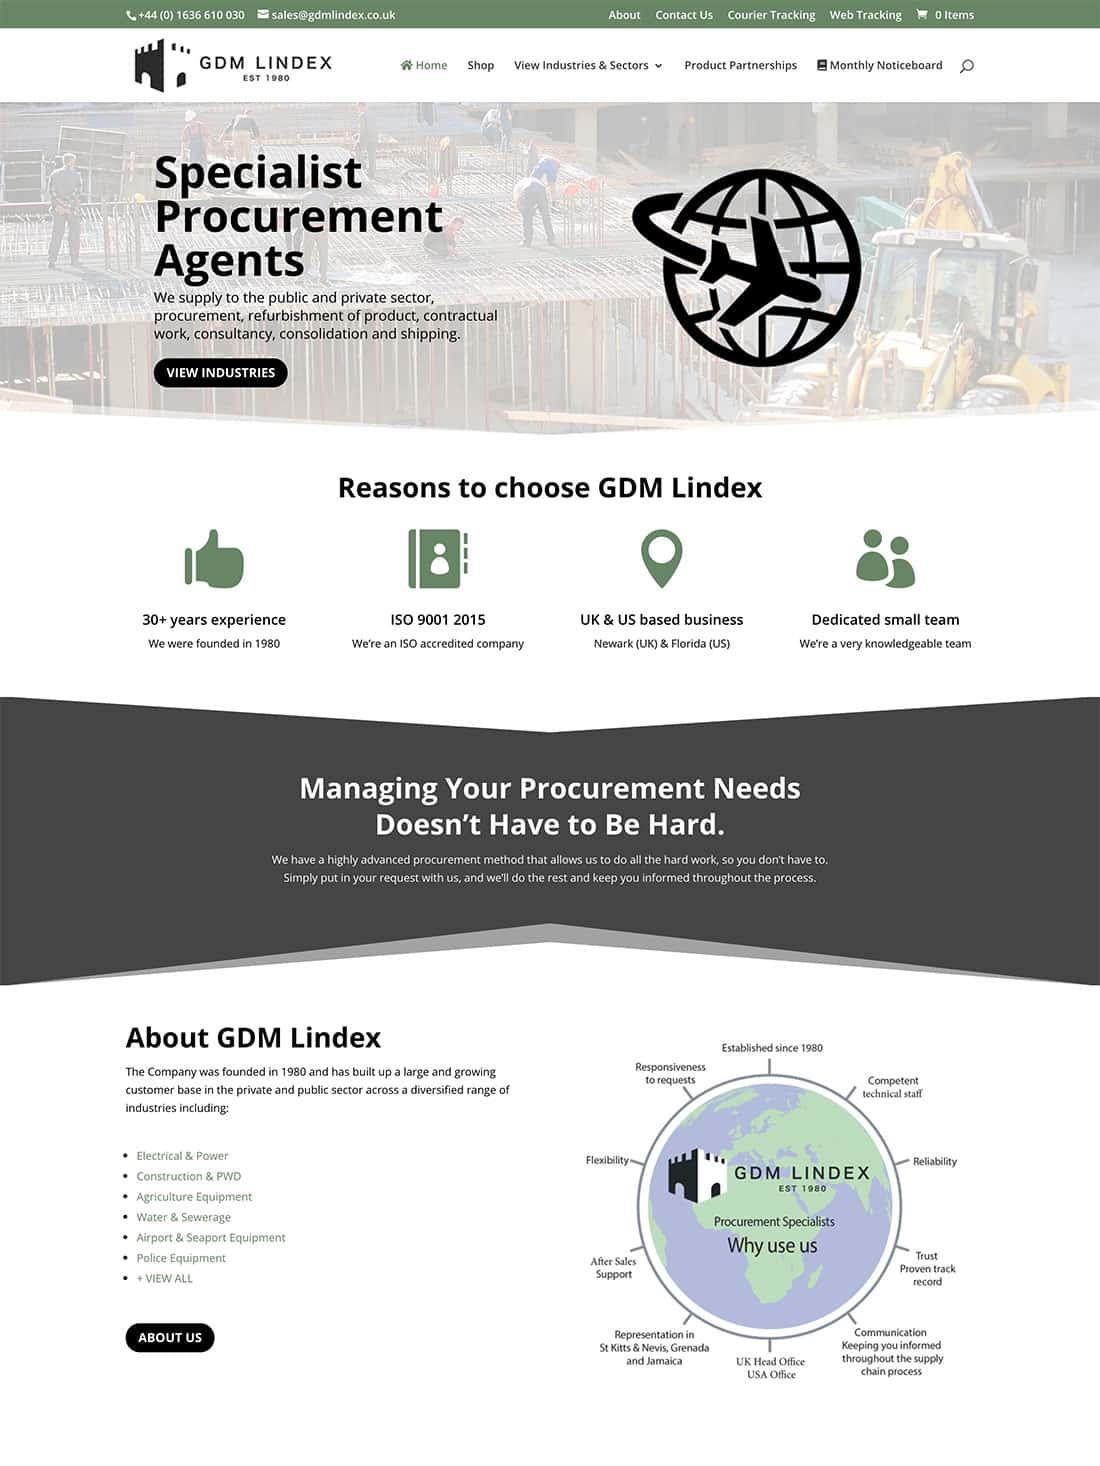 GDM Lindex homepage design